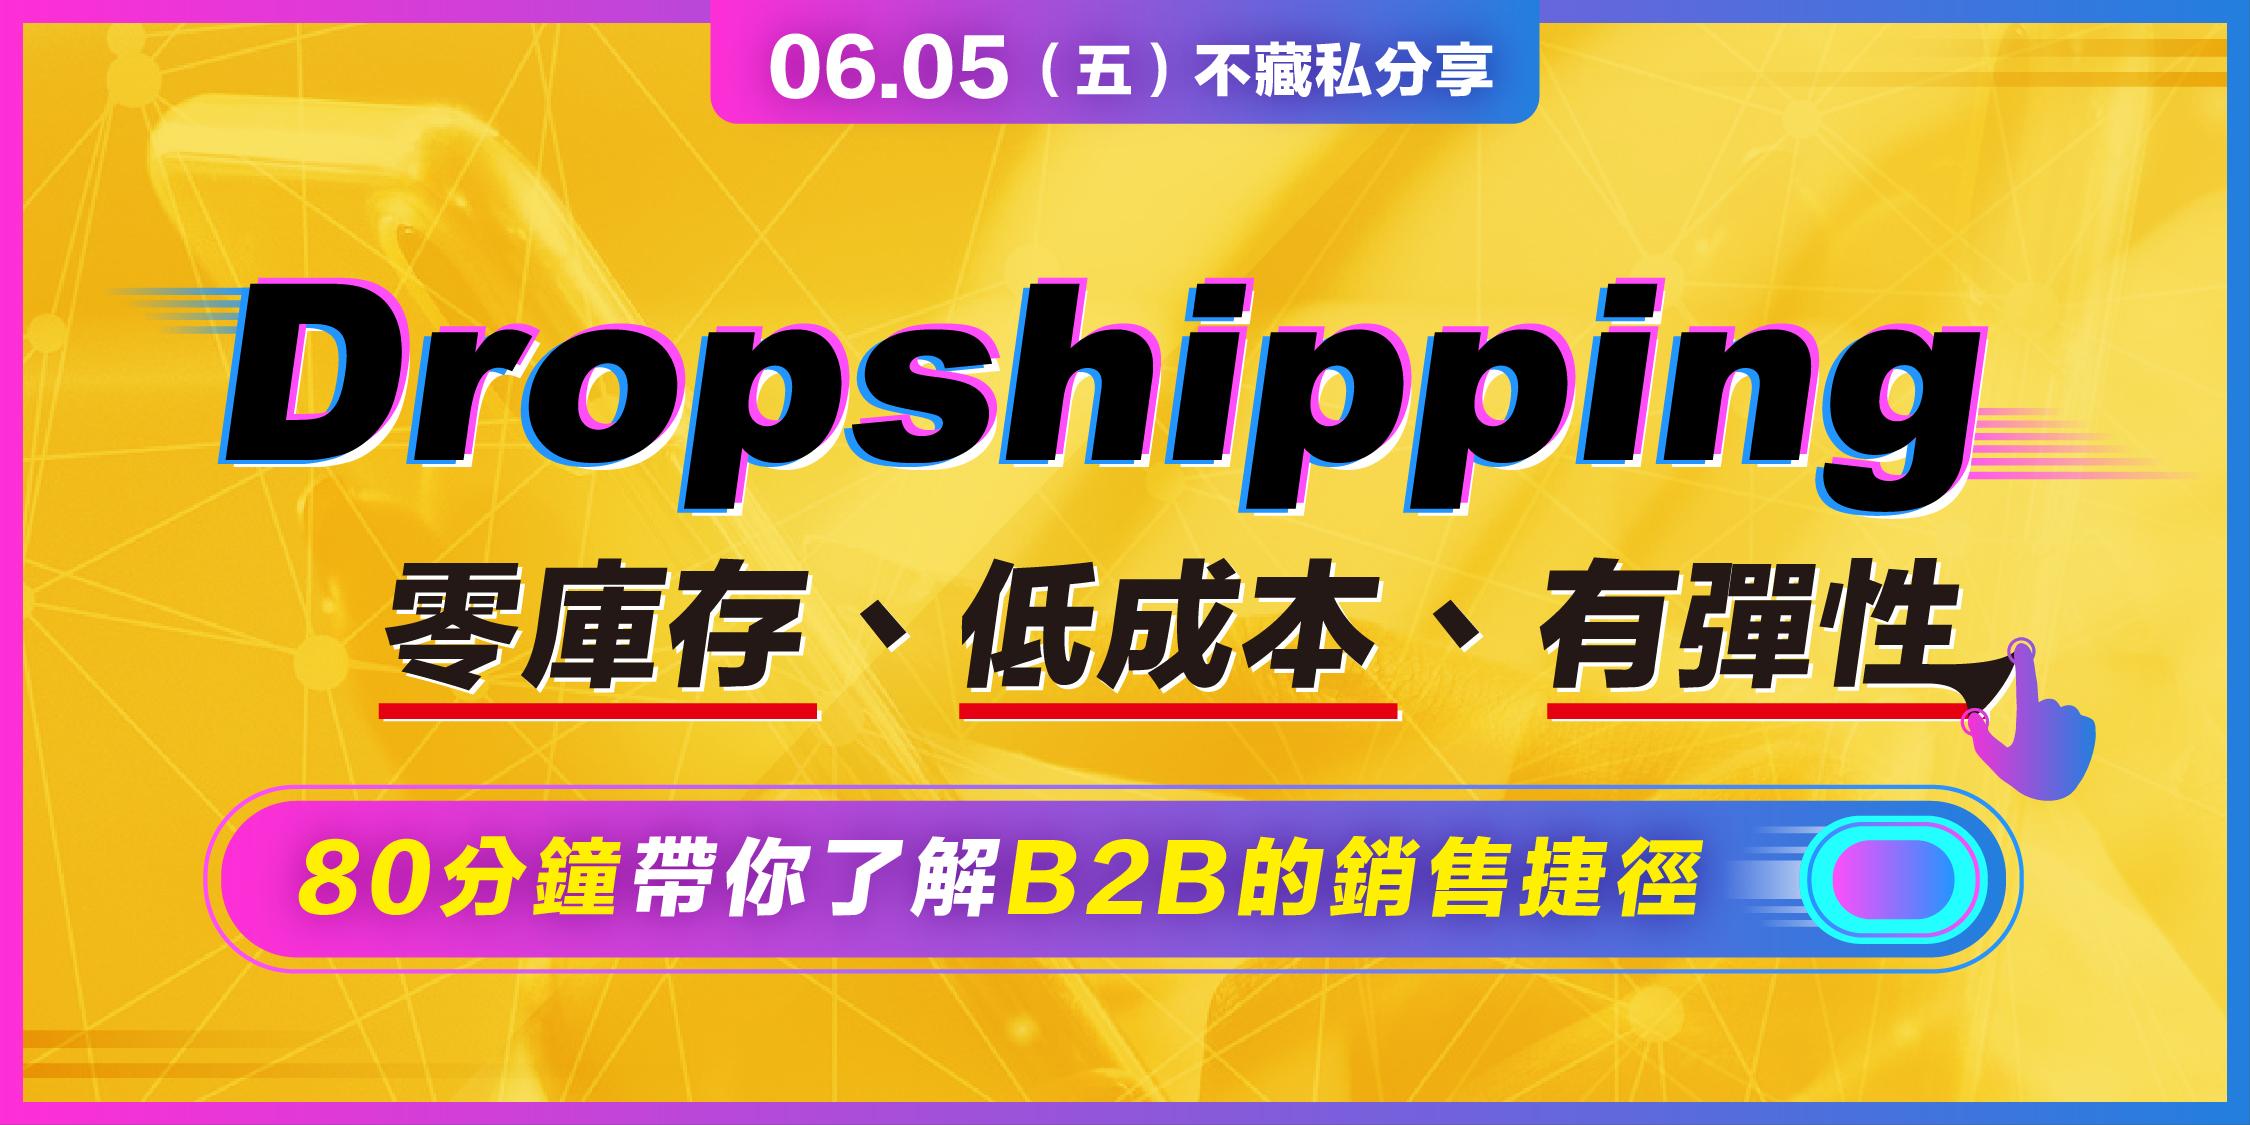 快銷時代-Dropshipping跨境獲利心法(入門班)